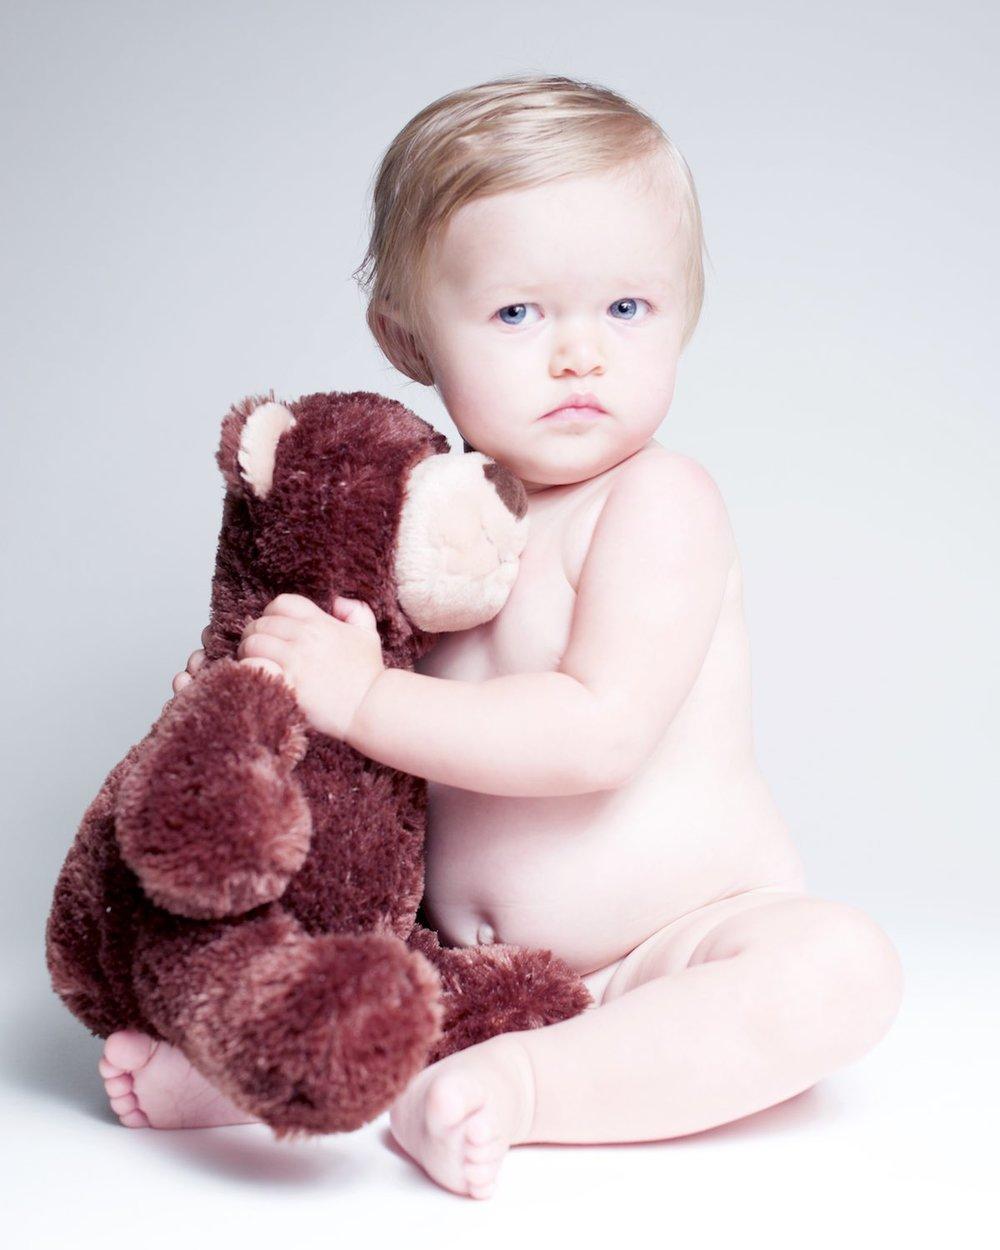 michal-pfeil-baby-portrait-11.jpg